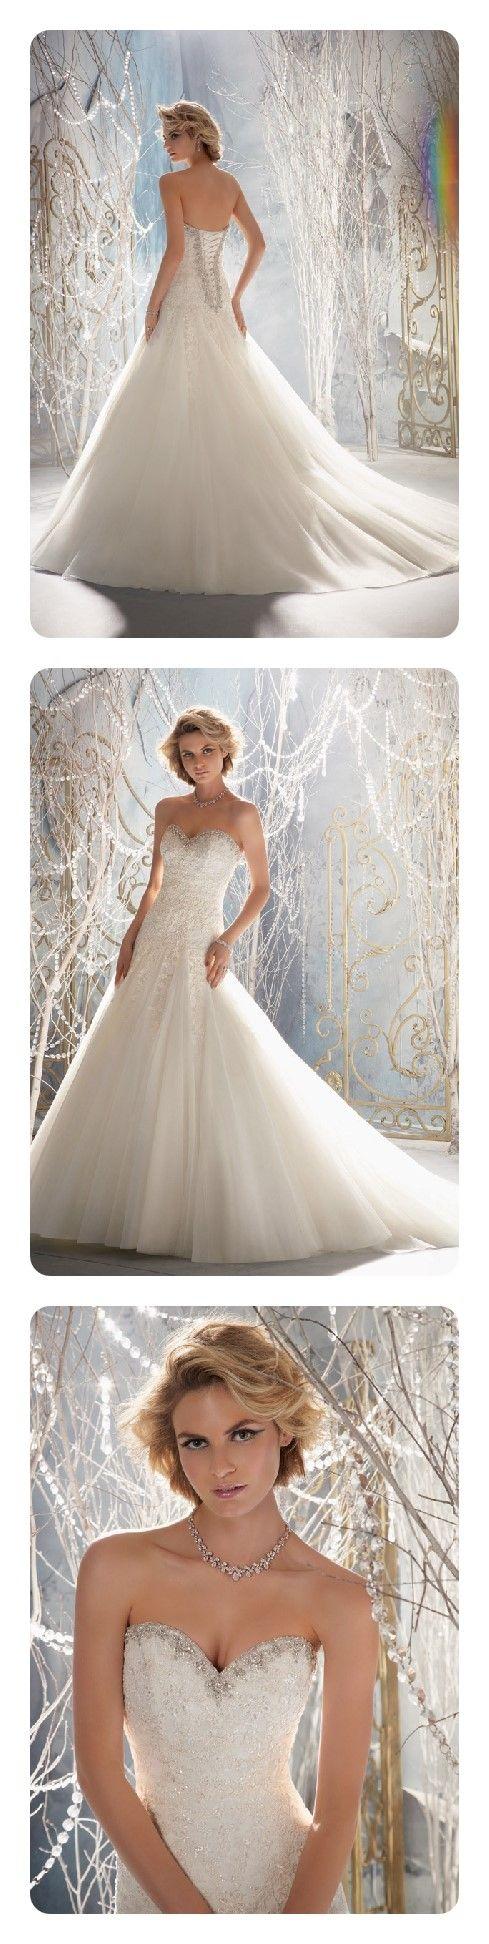 Mori lee 1964 the moderne bridal cork dresses pinterest